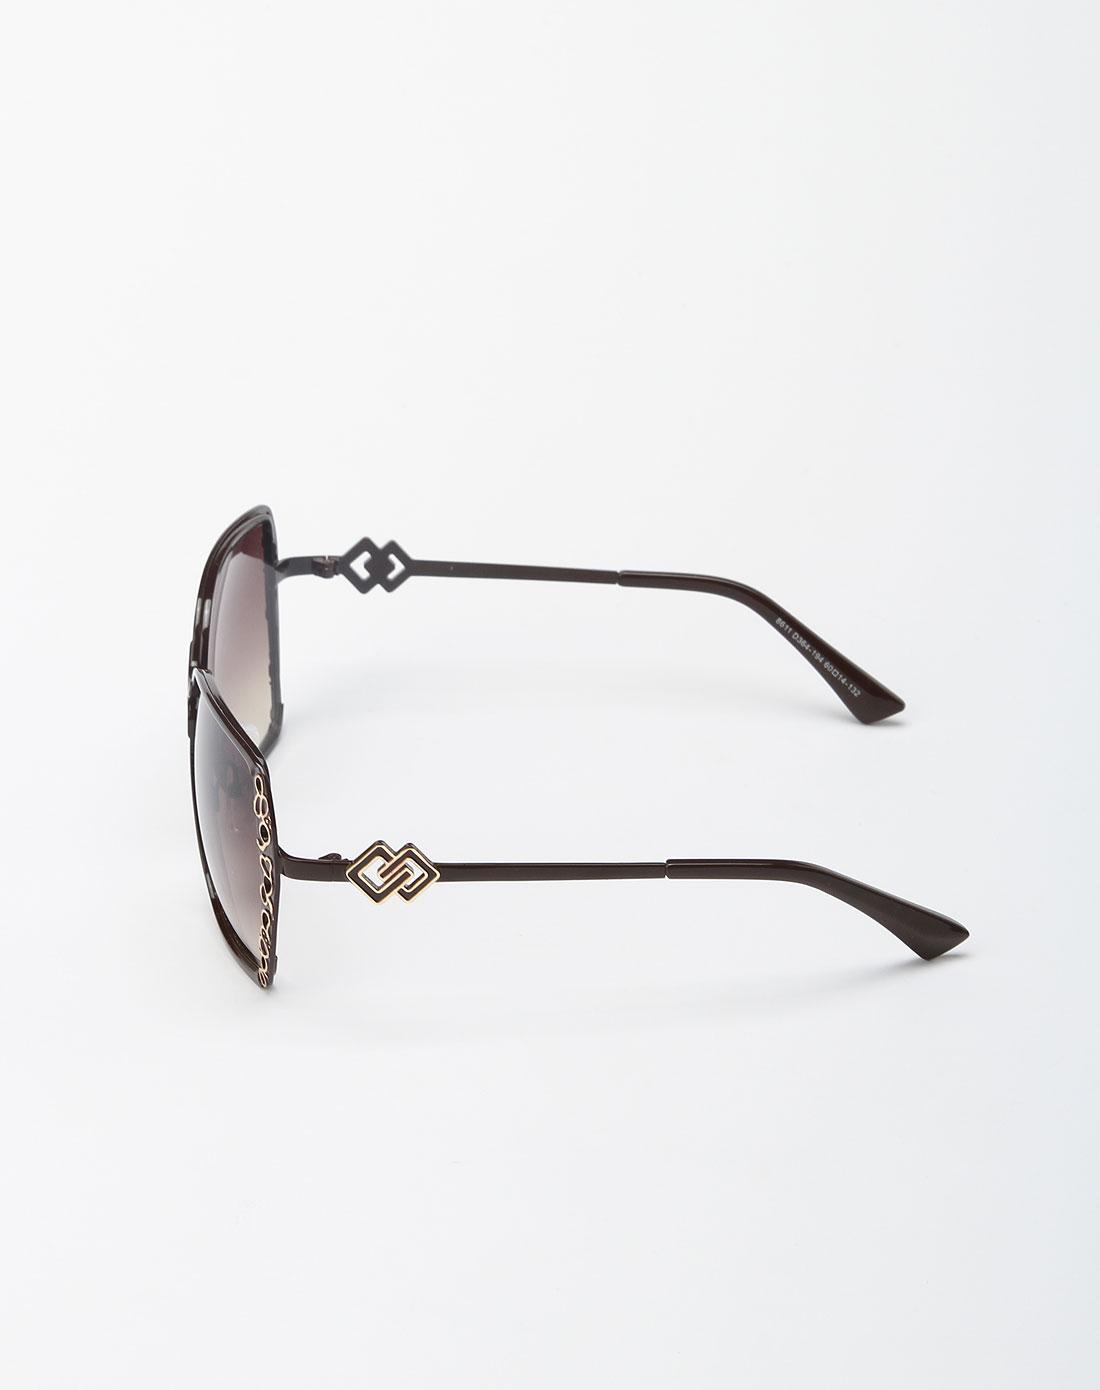 bailewei配件专场棕色可爱心形太阳眼镜7blw20129031